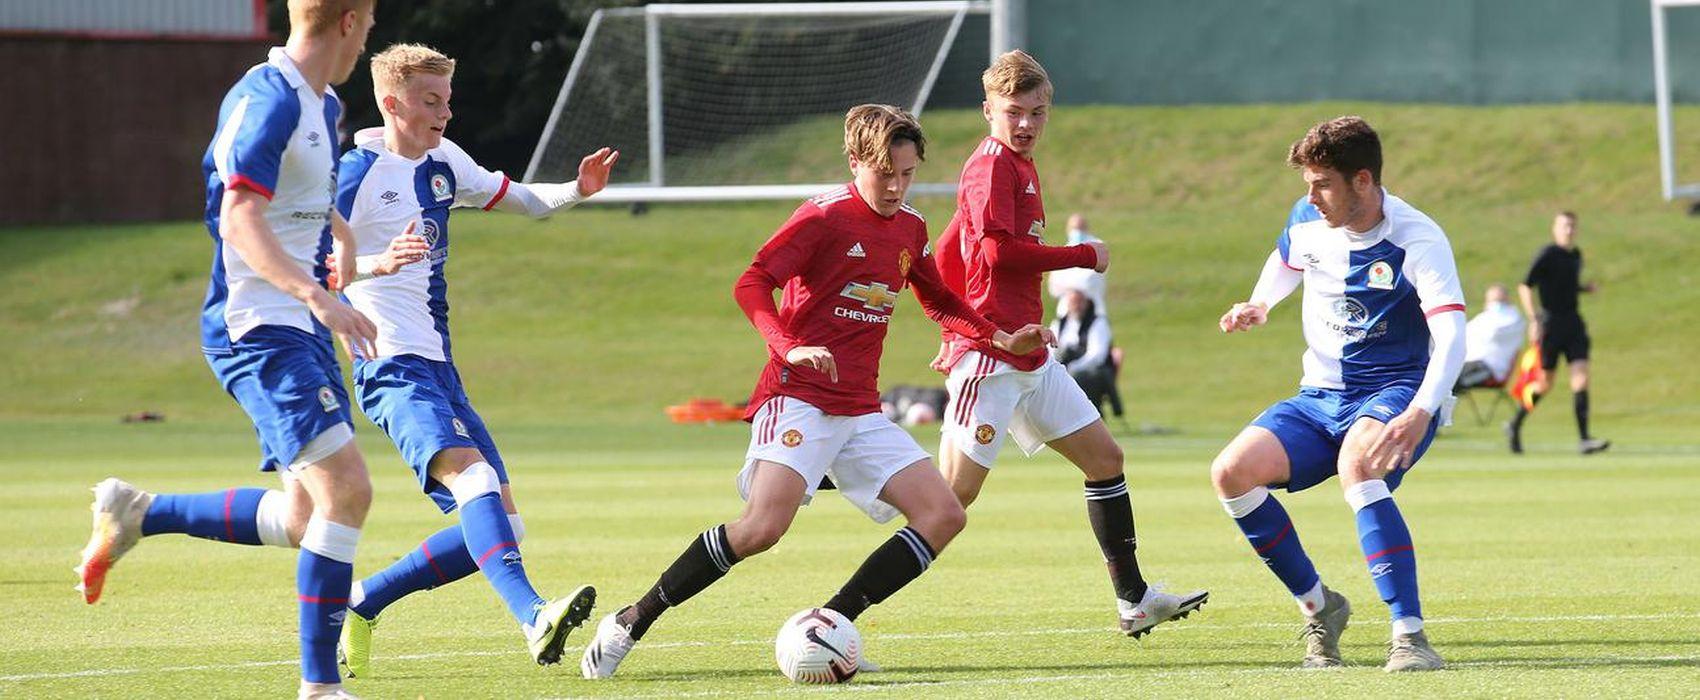 U-18 Premier League: Manchester United - Blackburn Rovers 2:1   ManUtd.pl - Serwis kibiców klubu Manchester United